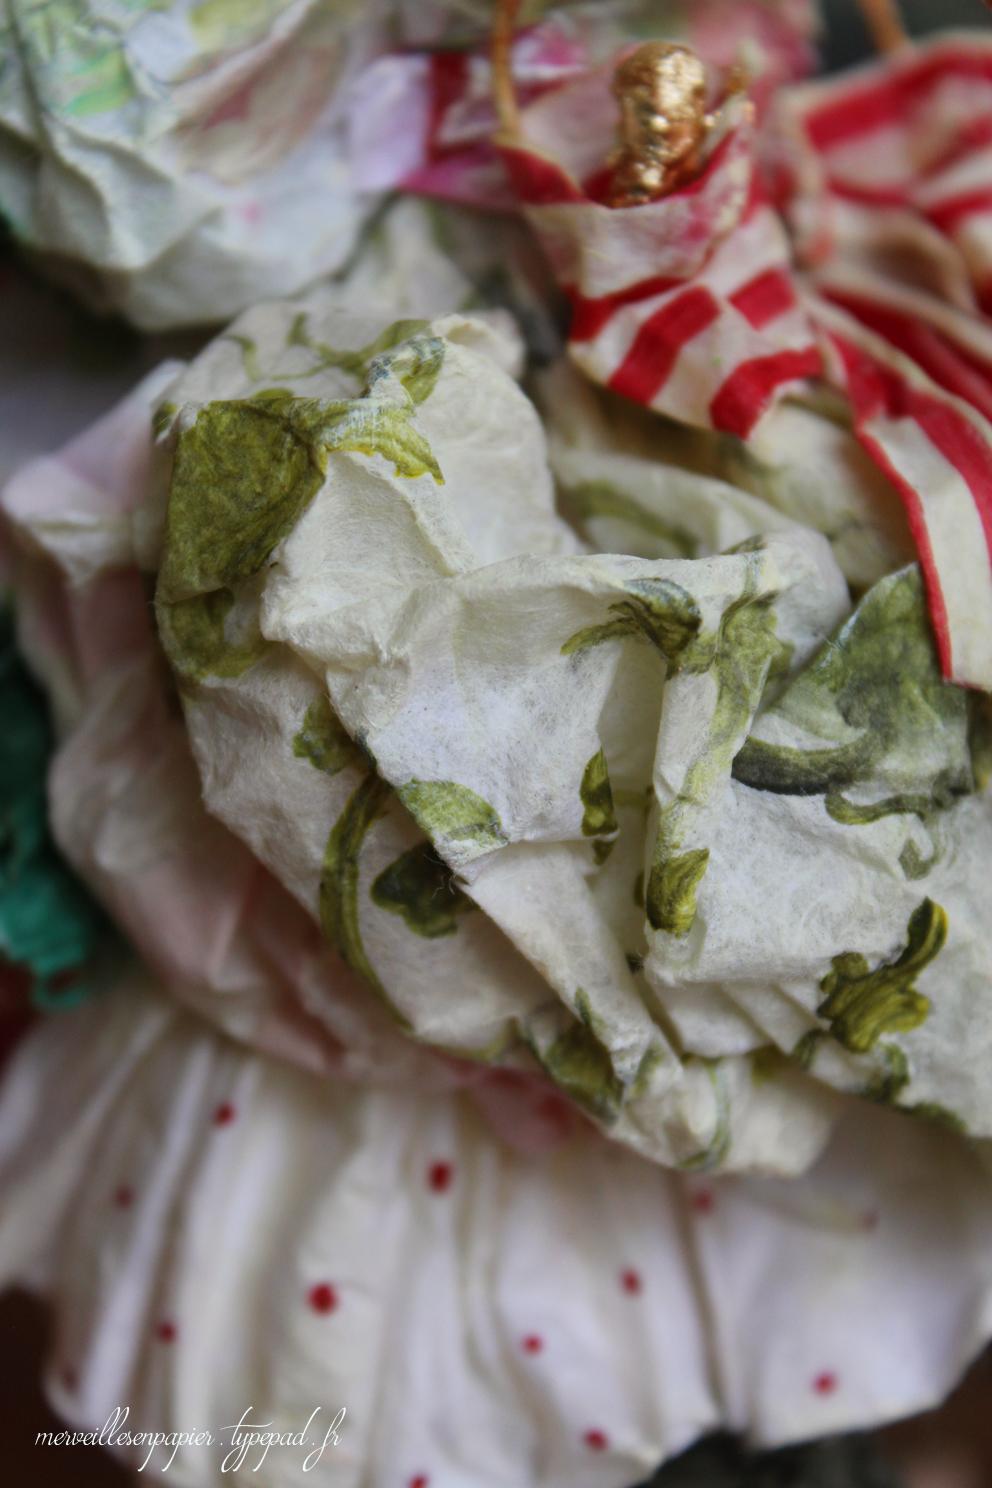 enfant-lapin-blanc-cygogne-11.jpg